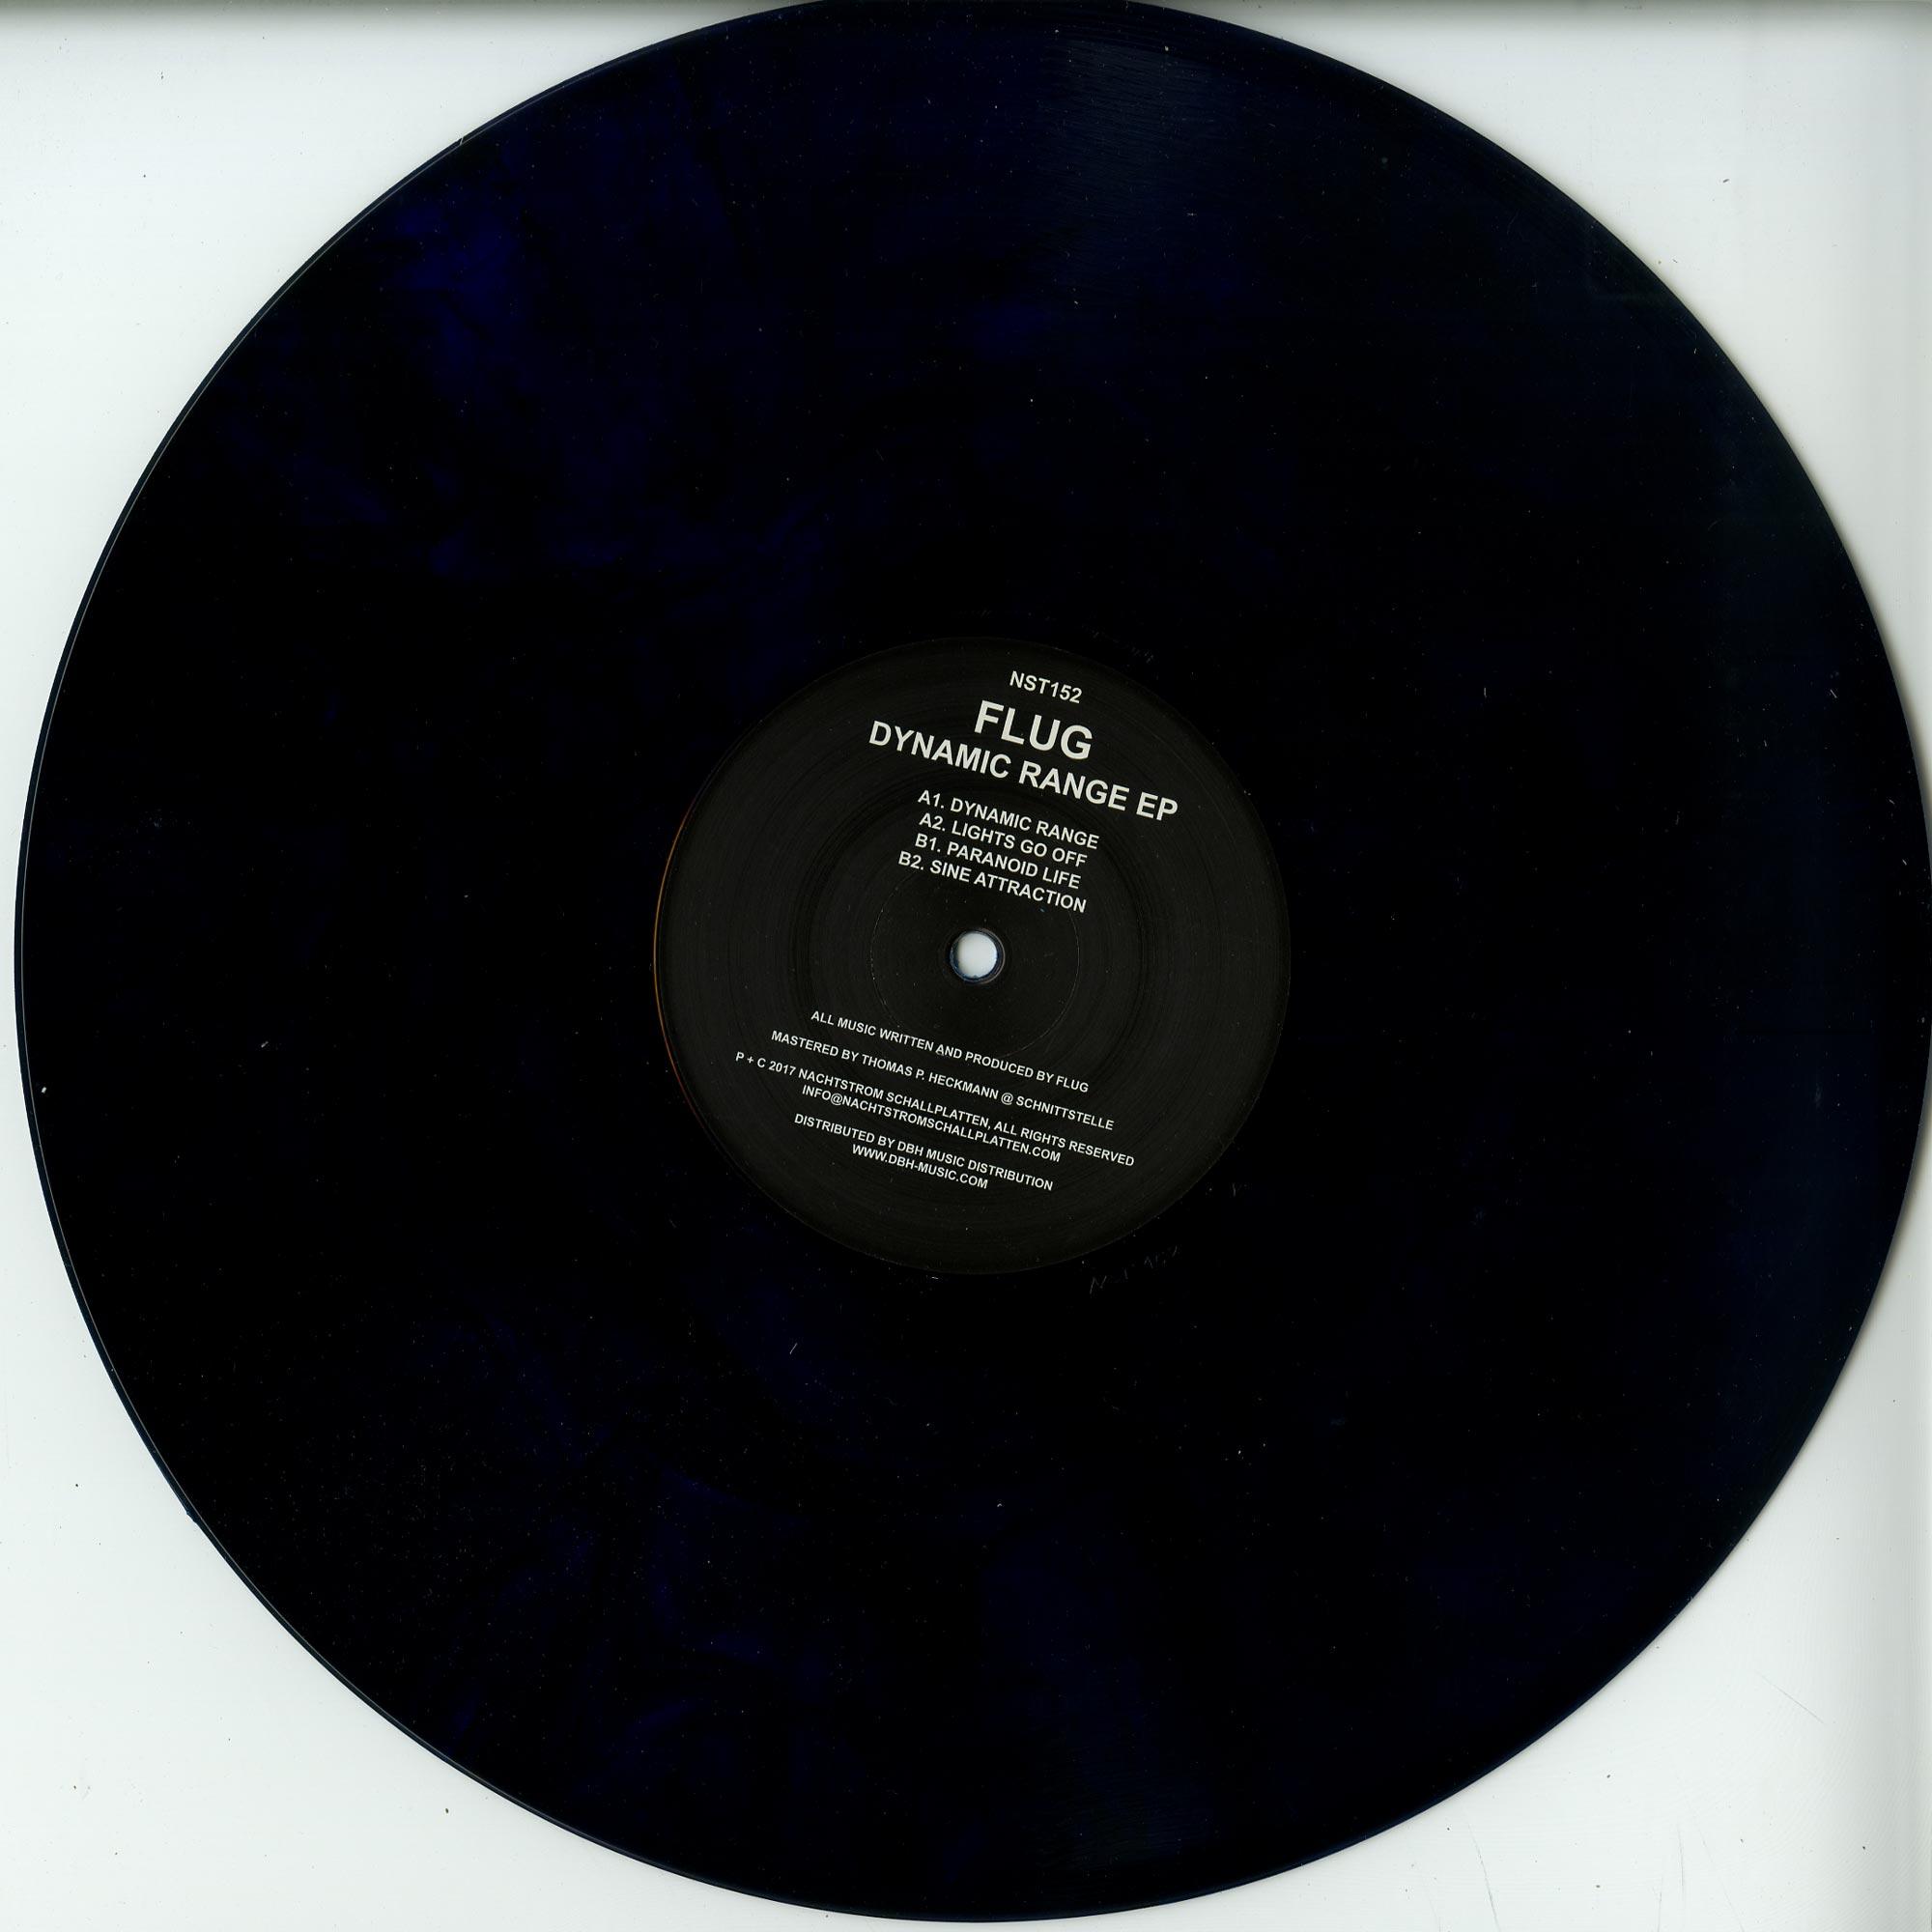 Flug - DYNAMIC RANGE EP